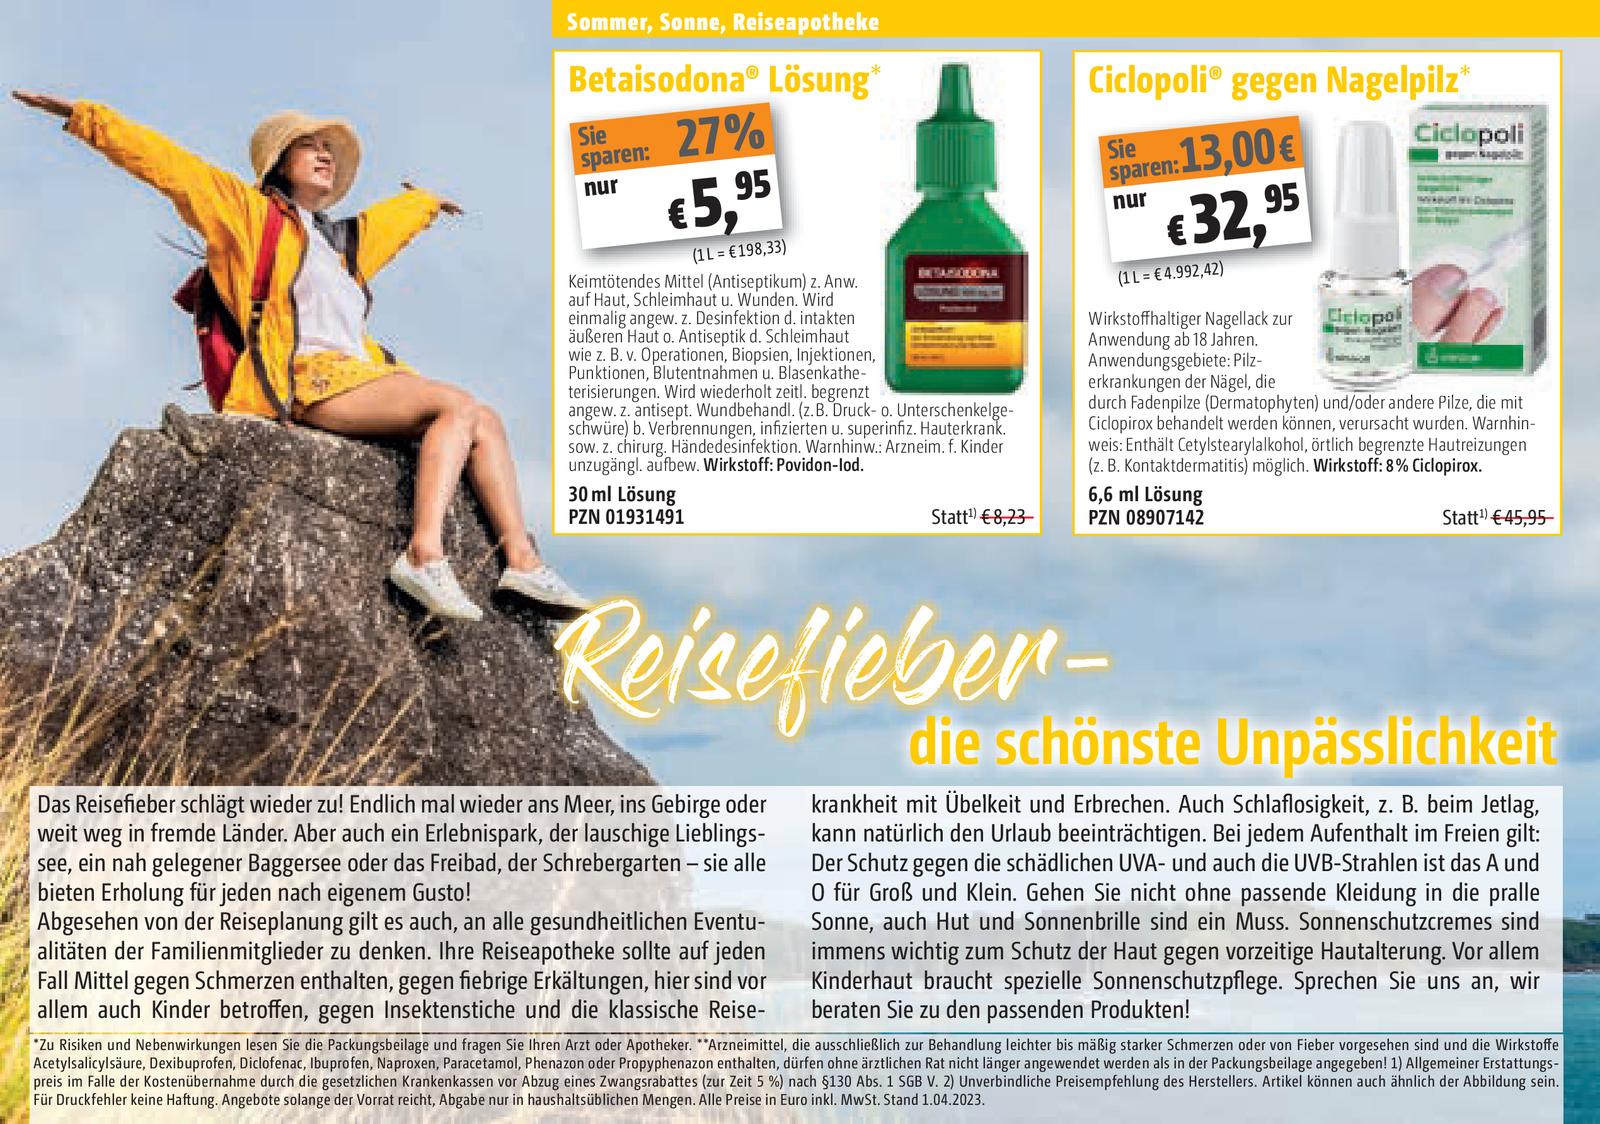 https://mein-uploads.apocdn.net/5424/leaflets/5424_flyer-Seite6.png